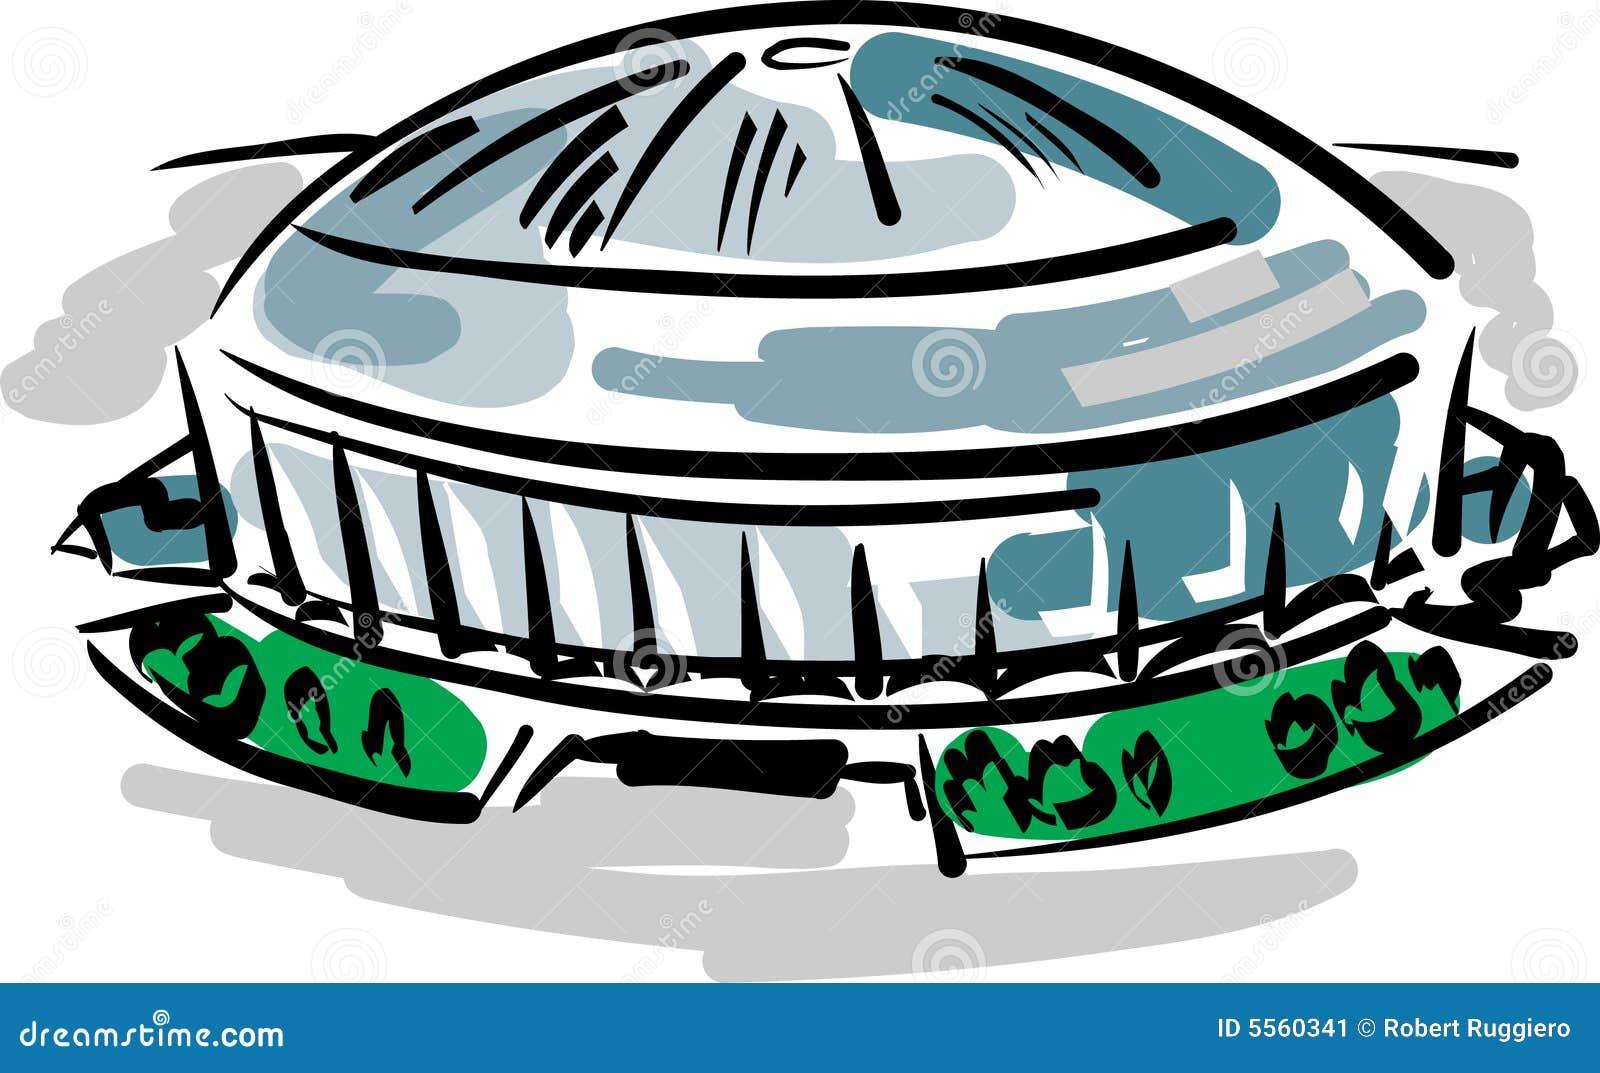 Astrodome Stock Image - Image: 5560341